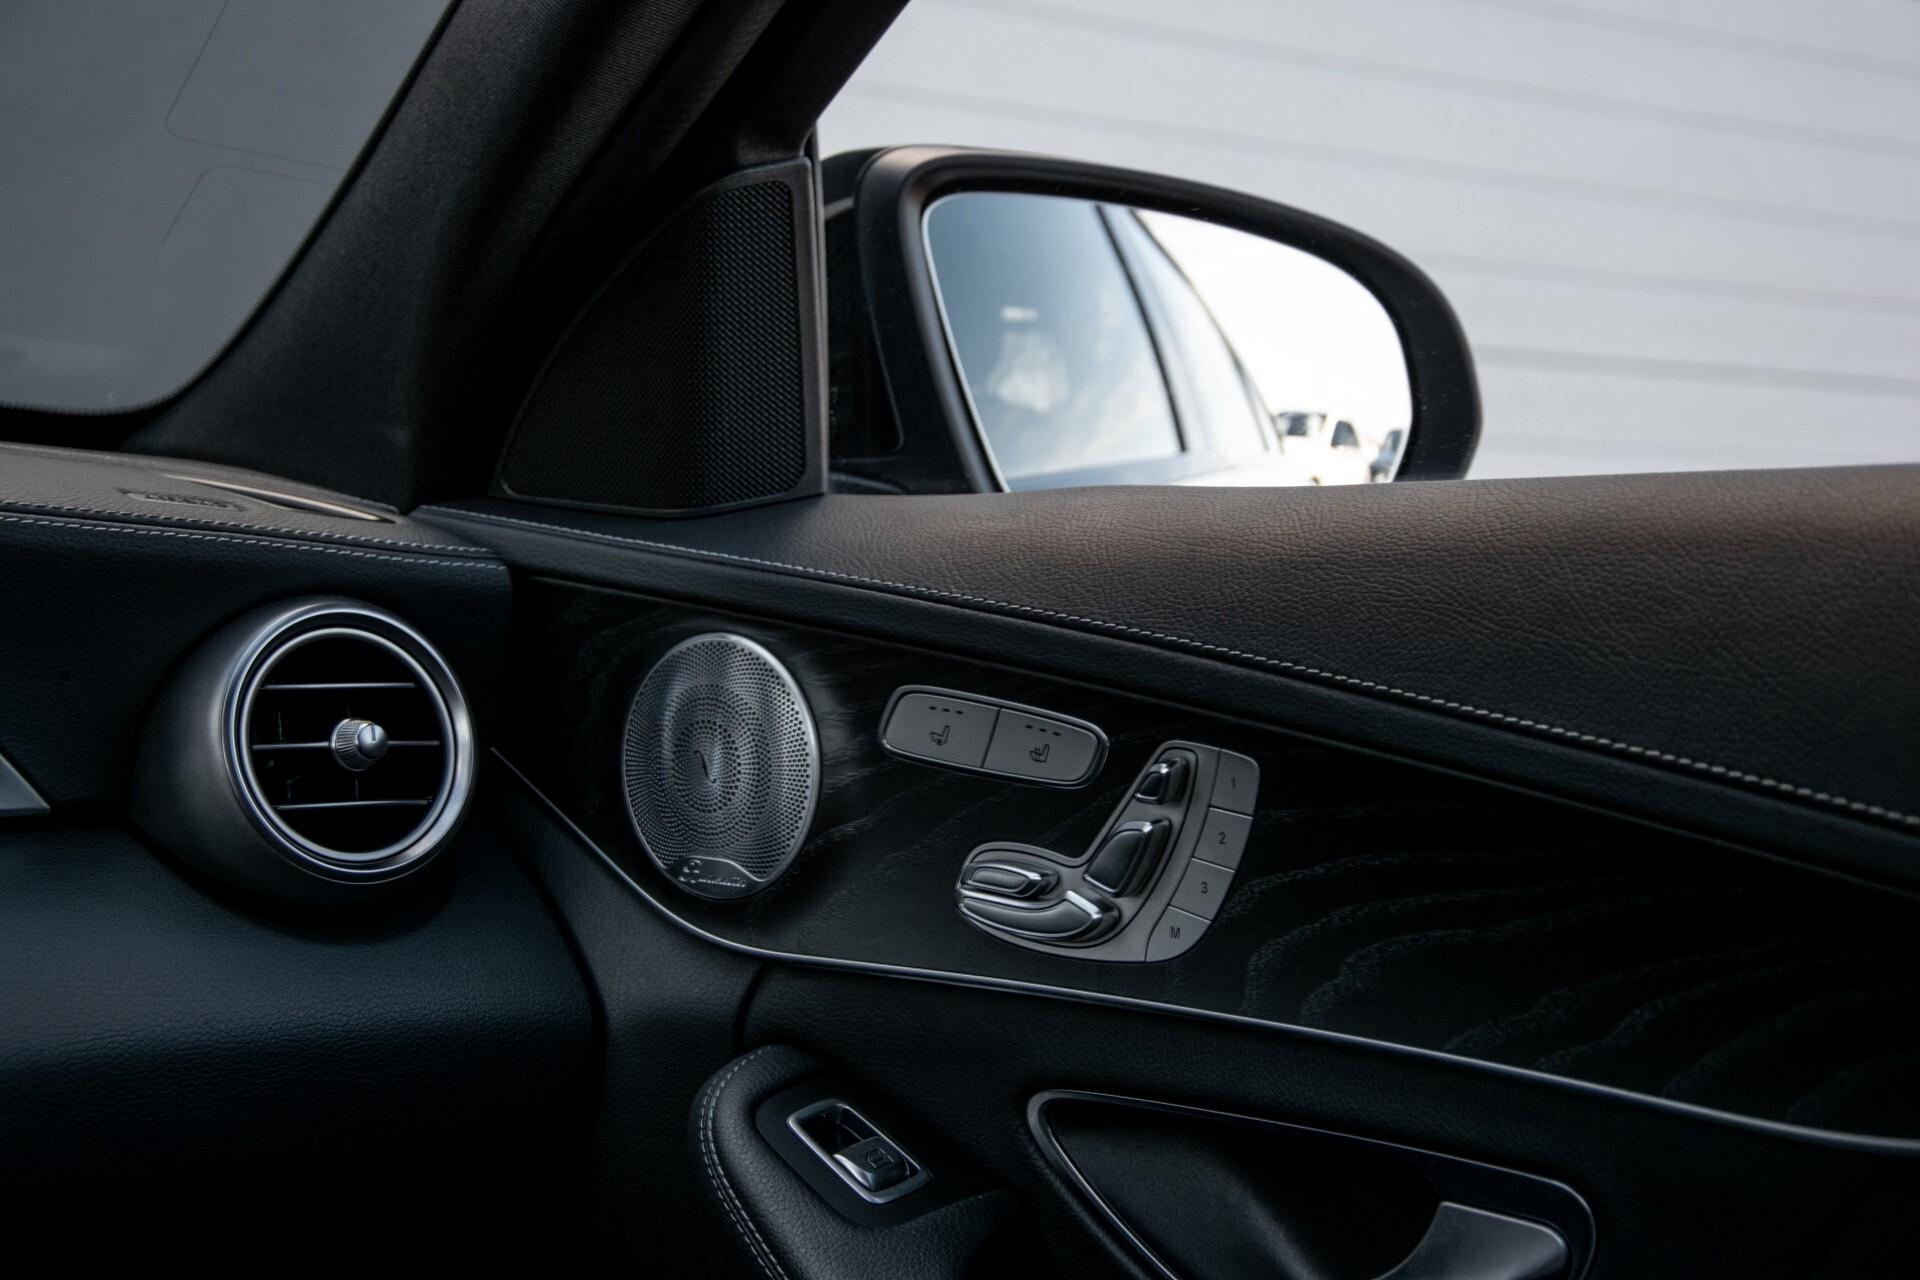 Mercedes-Benz C-Klasse 450/43 AMG 4-M Distronic/Standkachel/Panorama/Keyless/Harman-Kardon/Stoelkoeling Aut7 Foto 52